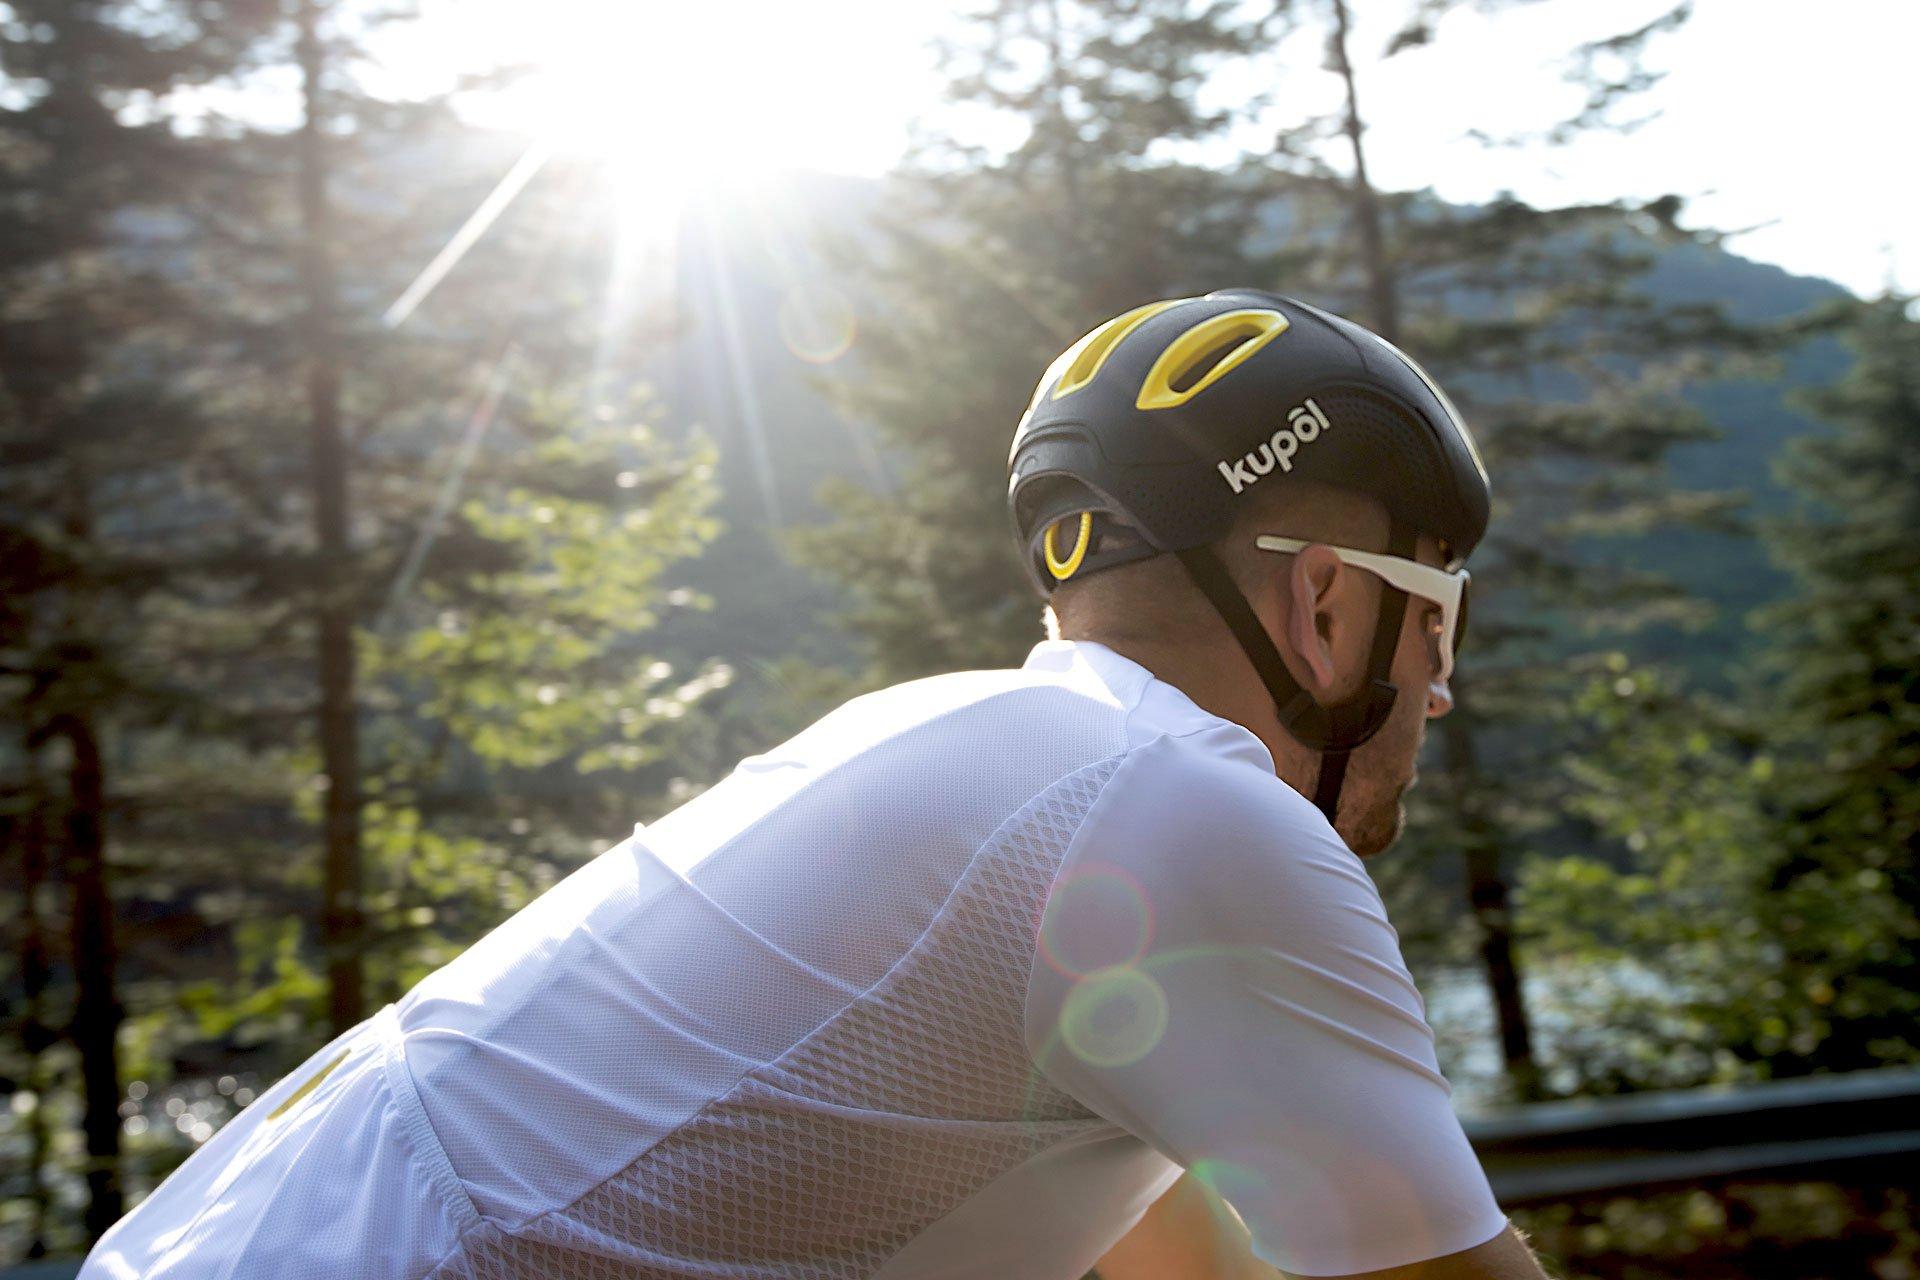 3D printed Kupol helmet is the future of head protection